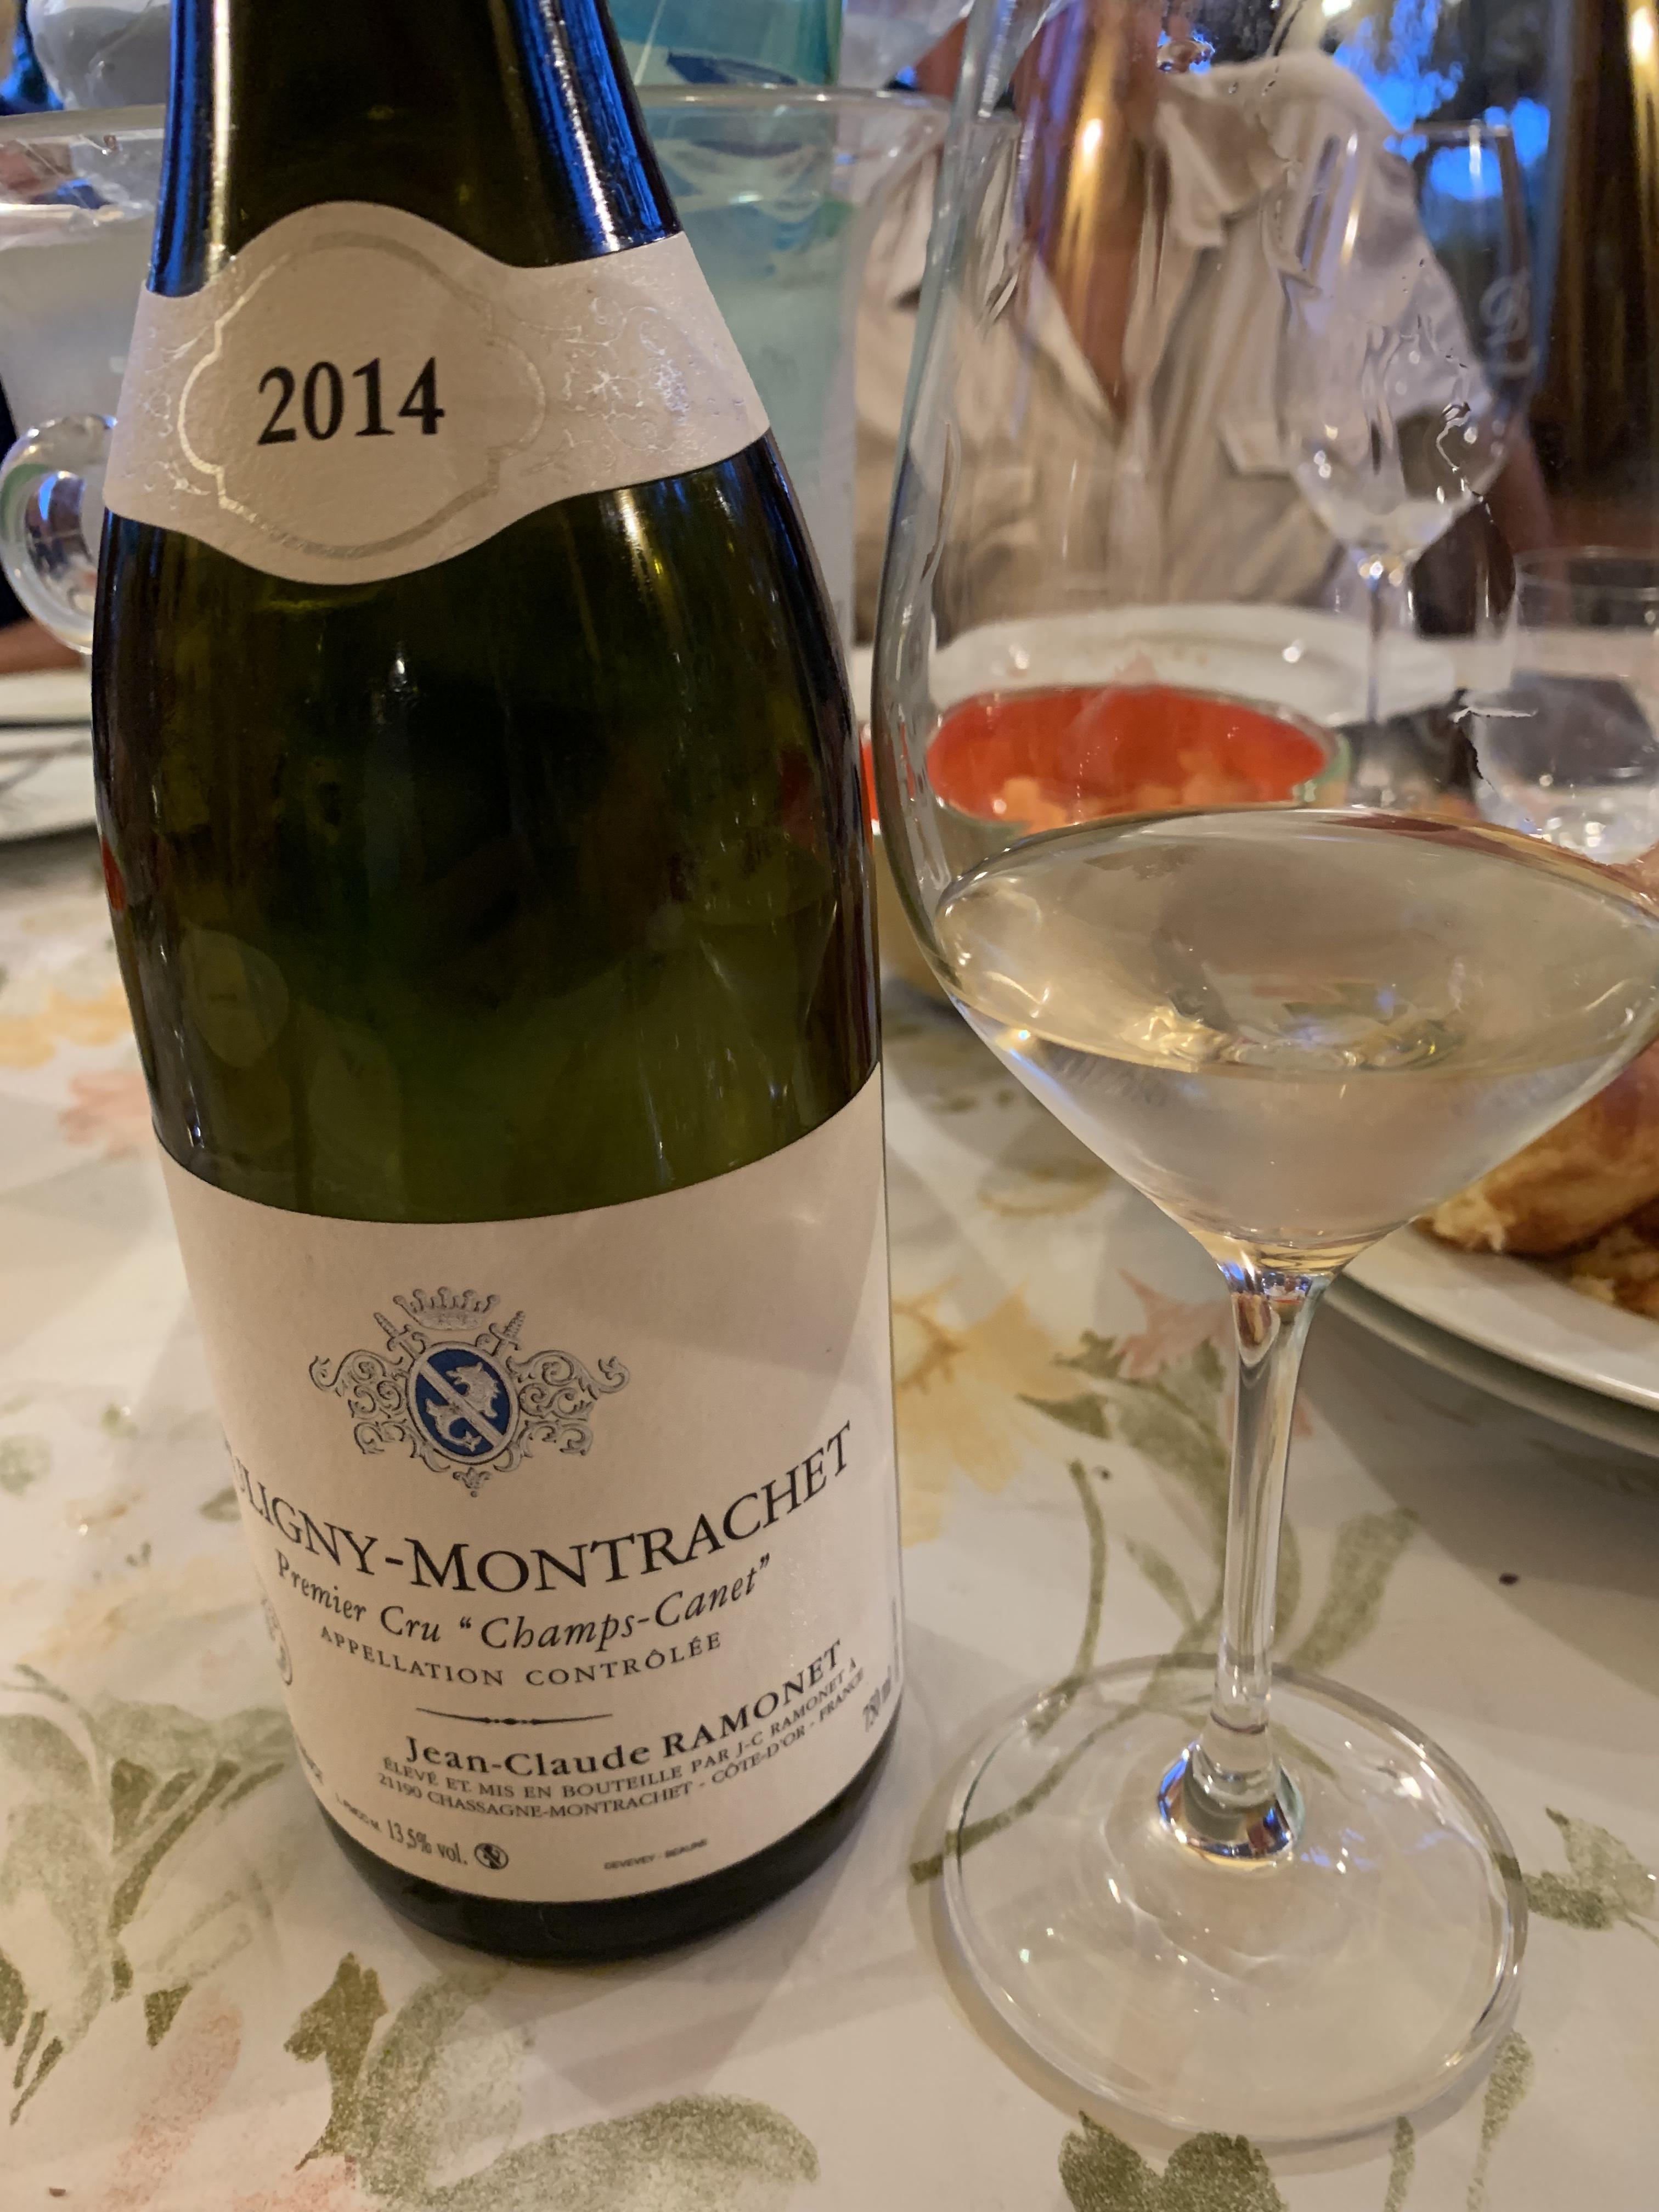 Puligny Montrachet 2014 1er Cru Champs Canet Ramonet